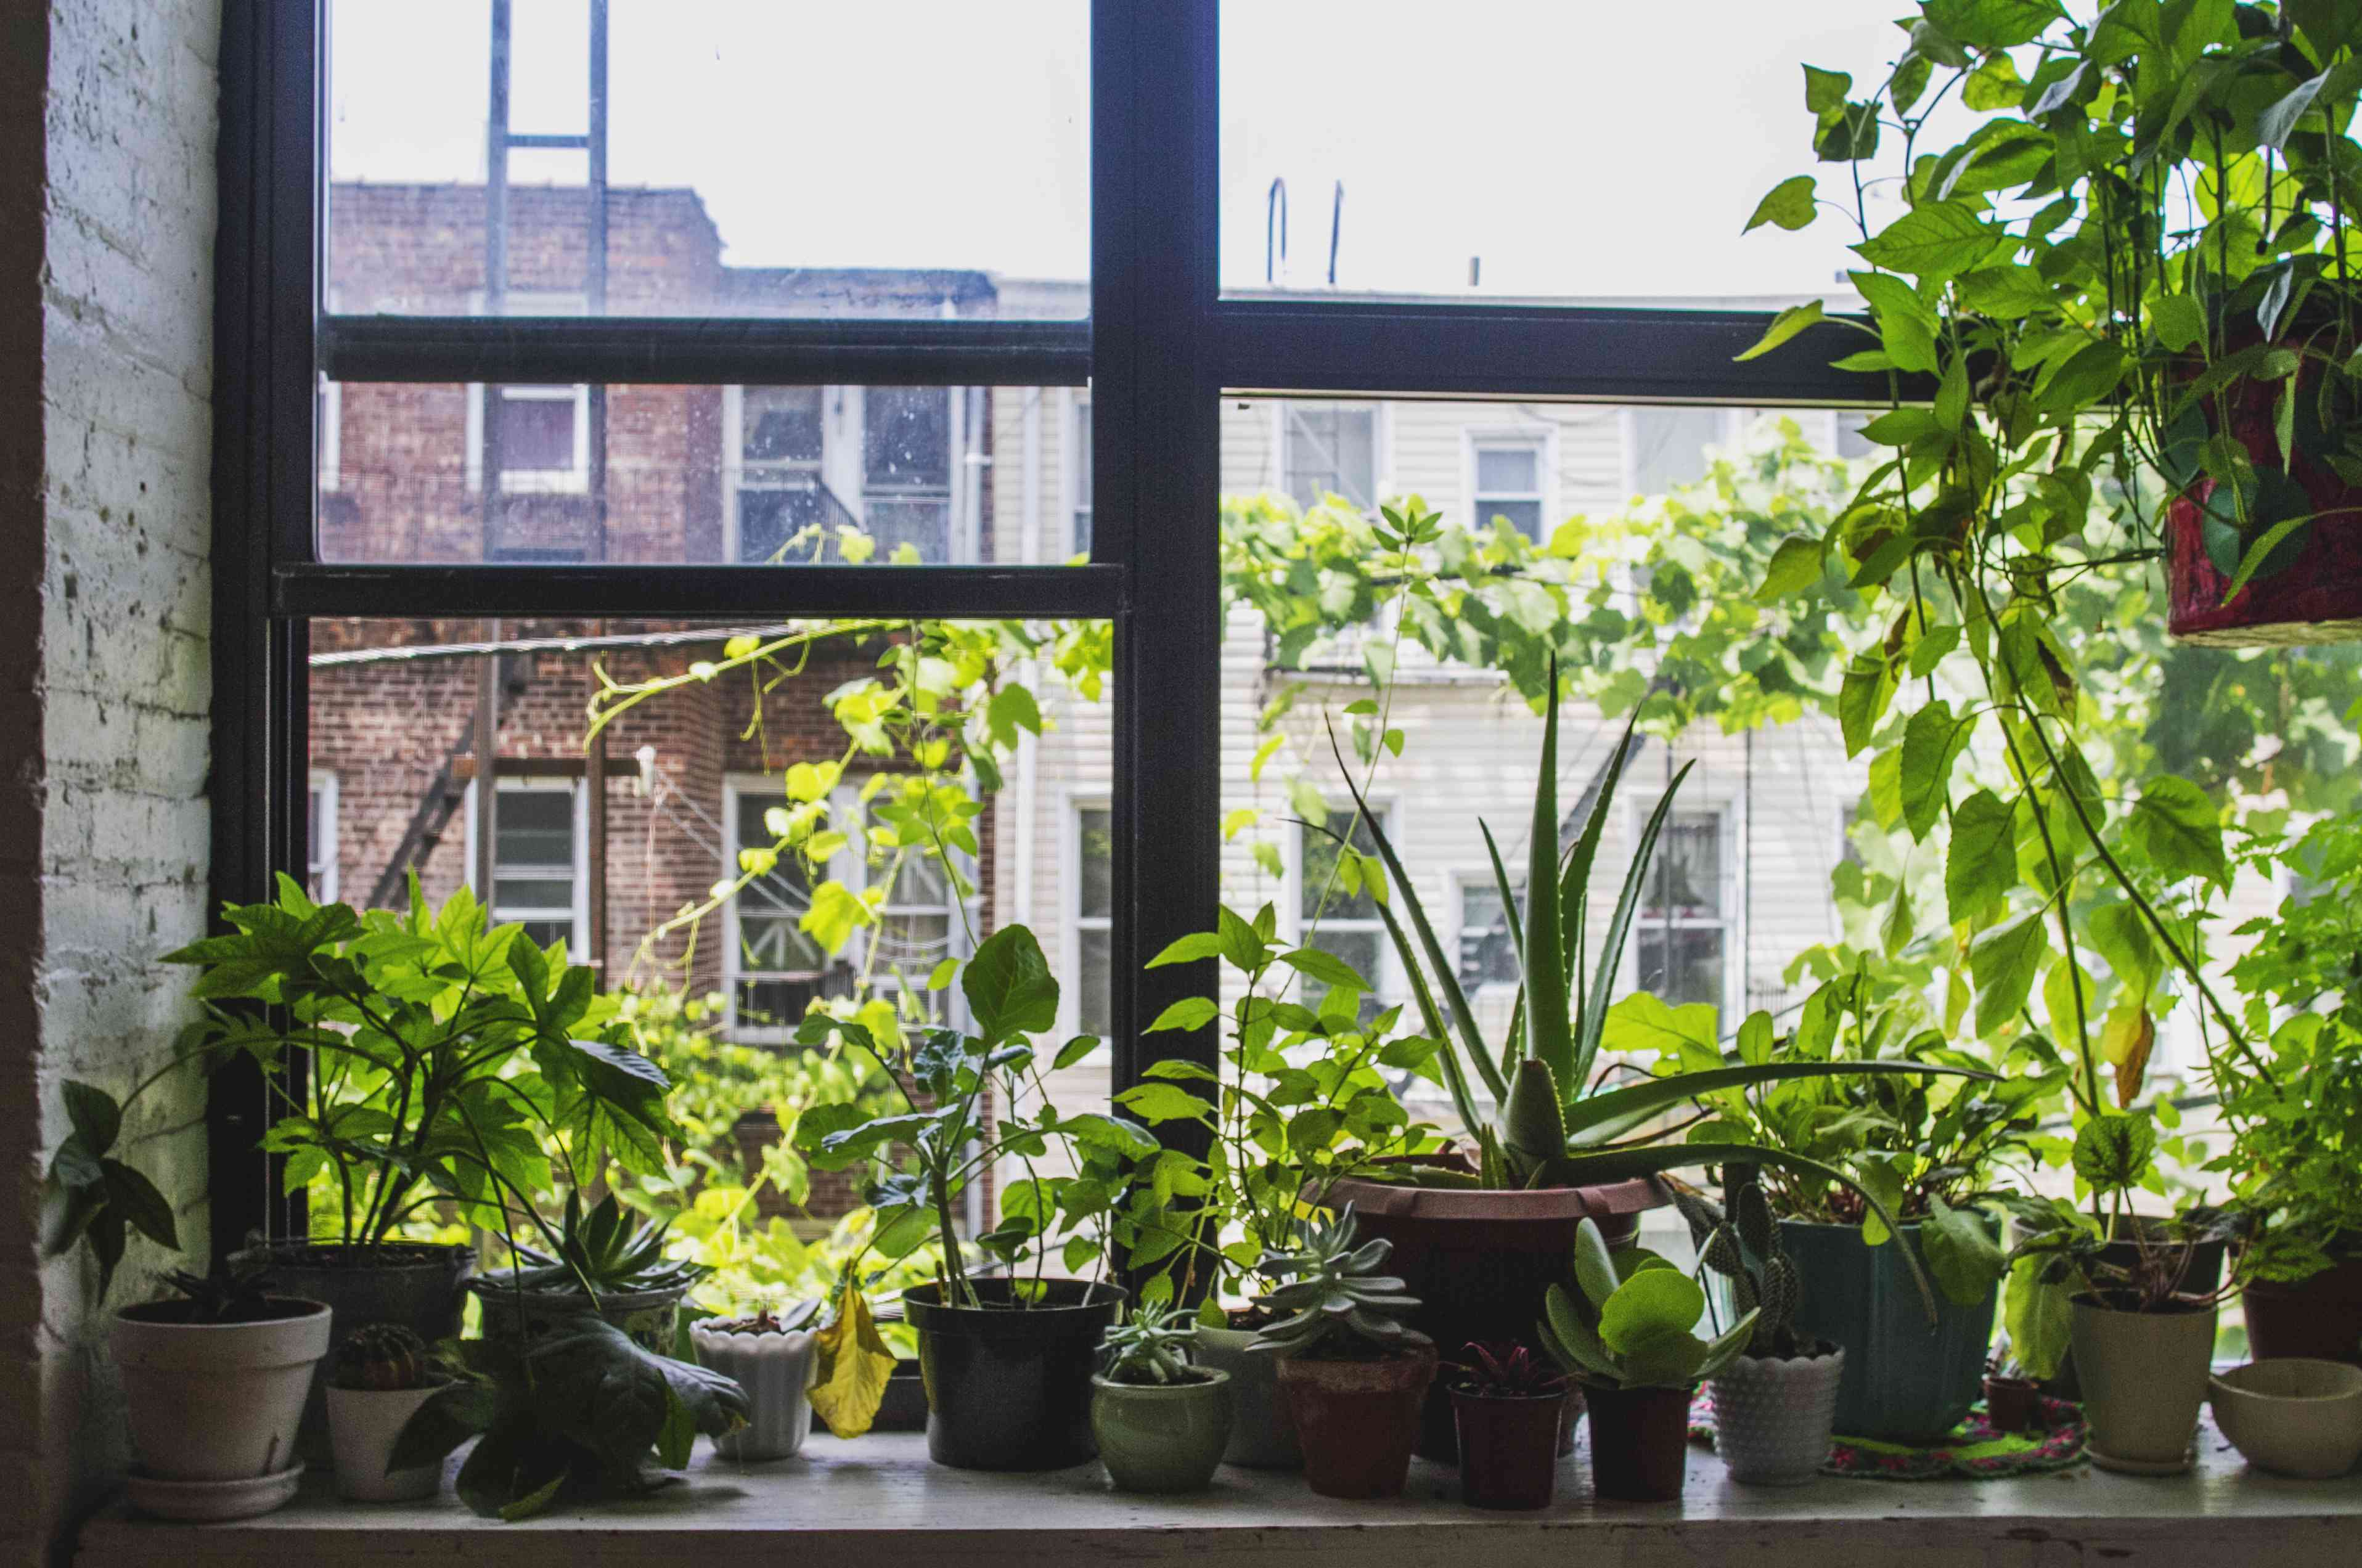 houseplants in a windowsill in Brooklyn, New York City